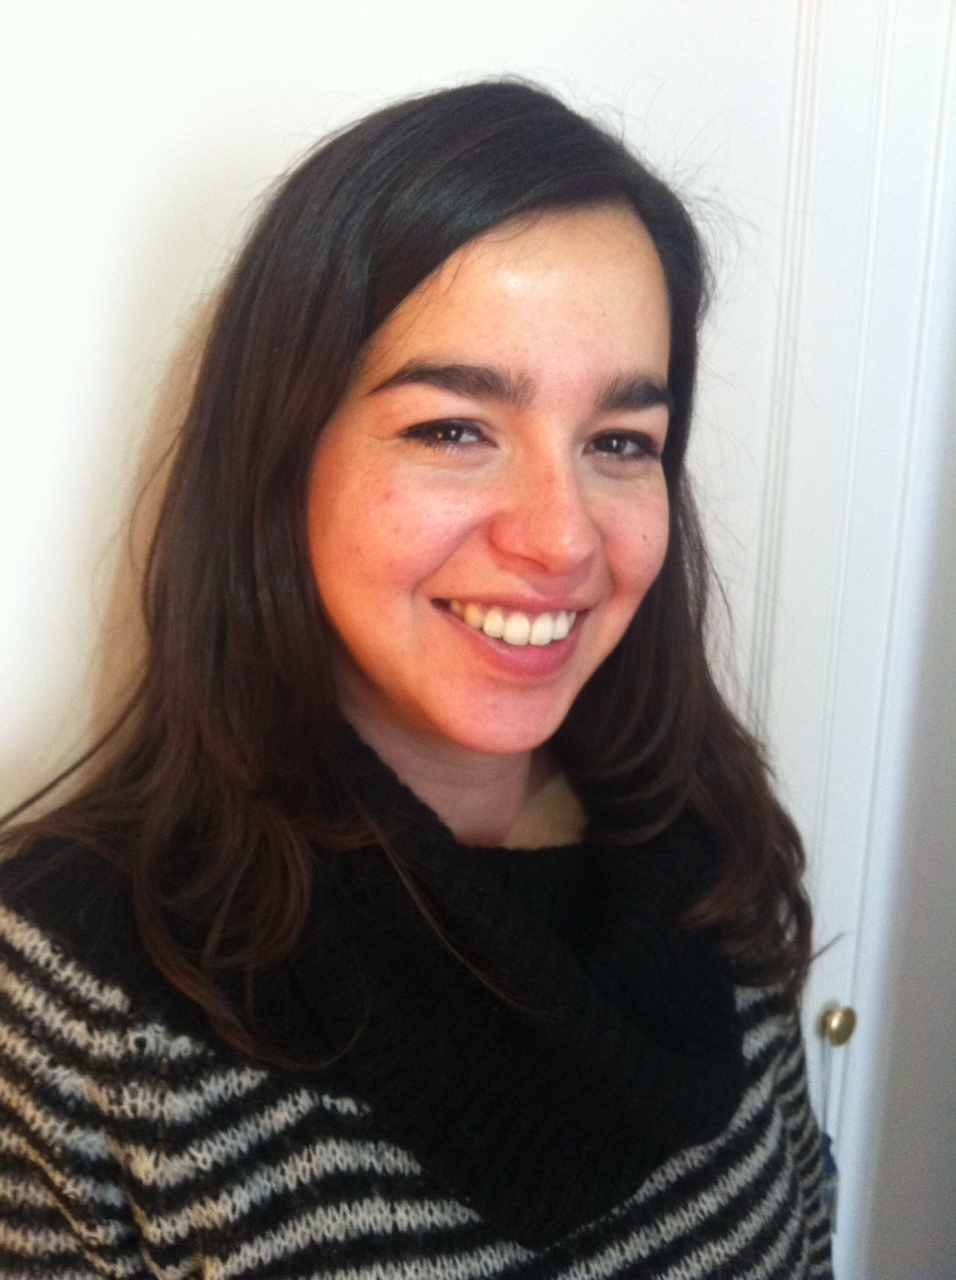 Berta Carreño